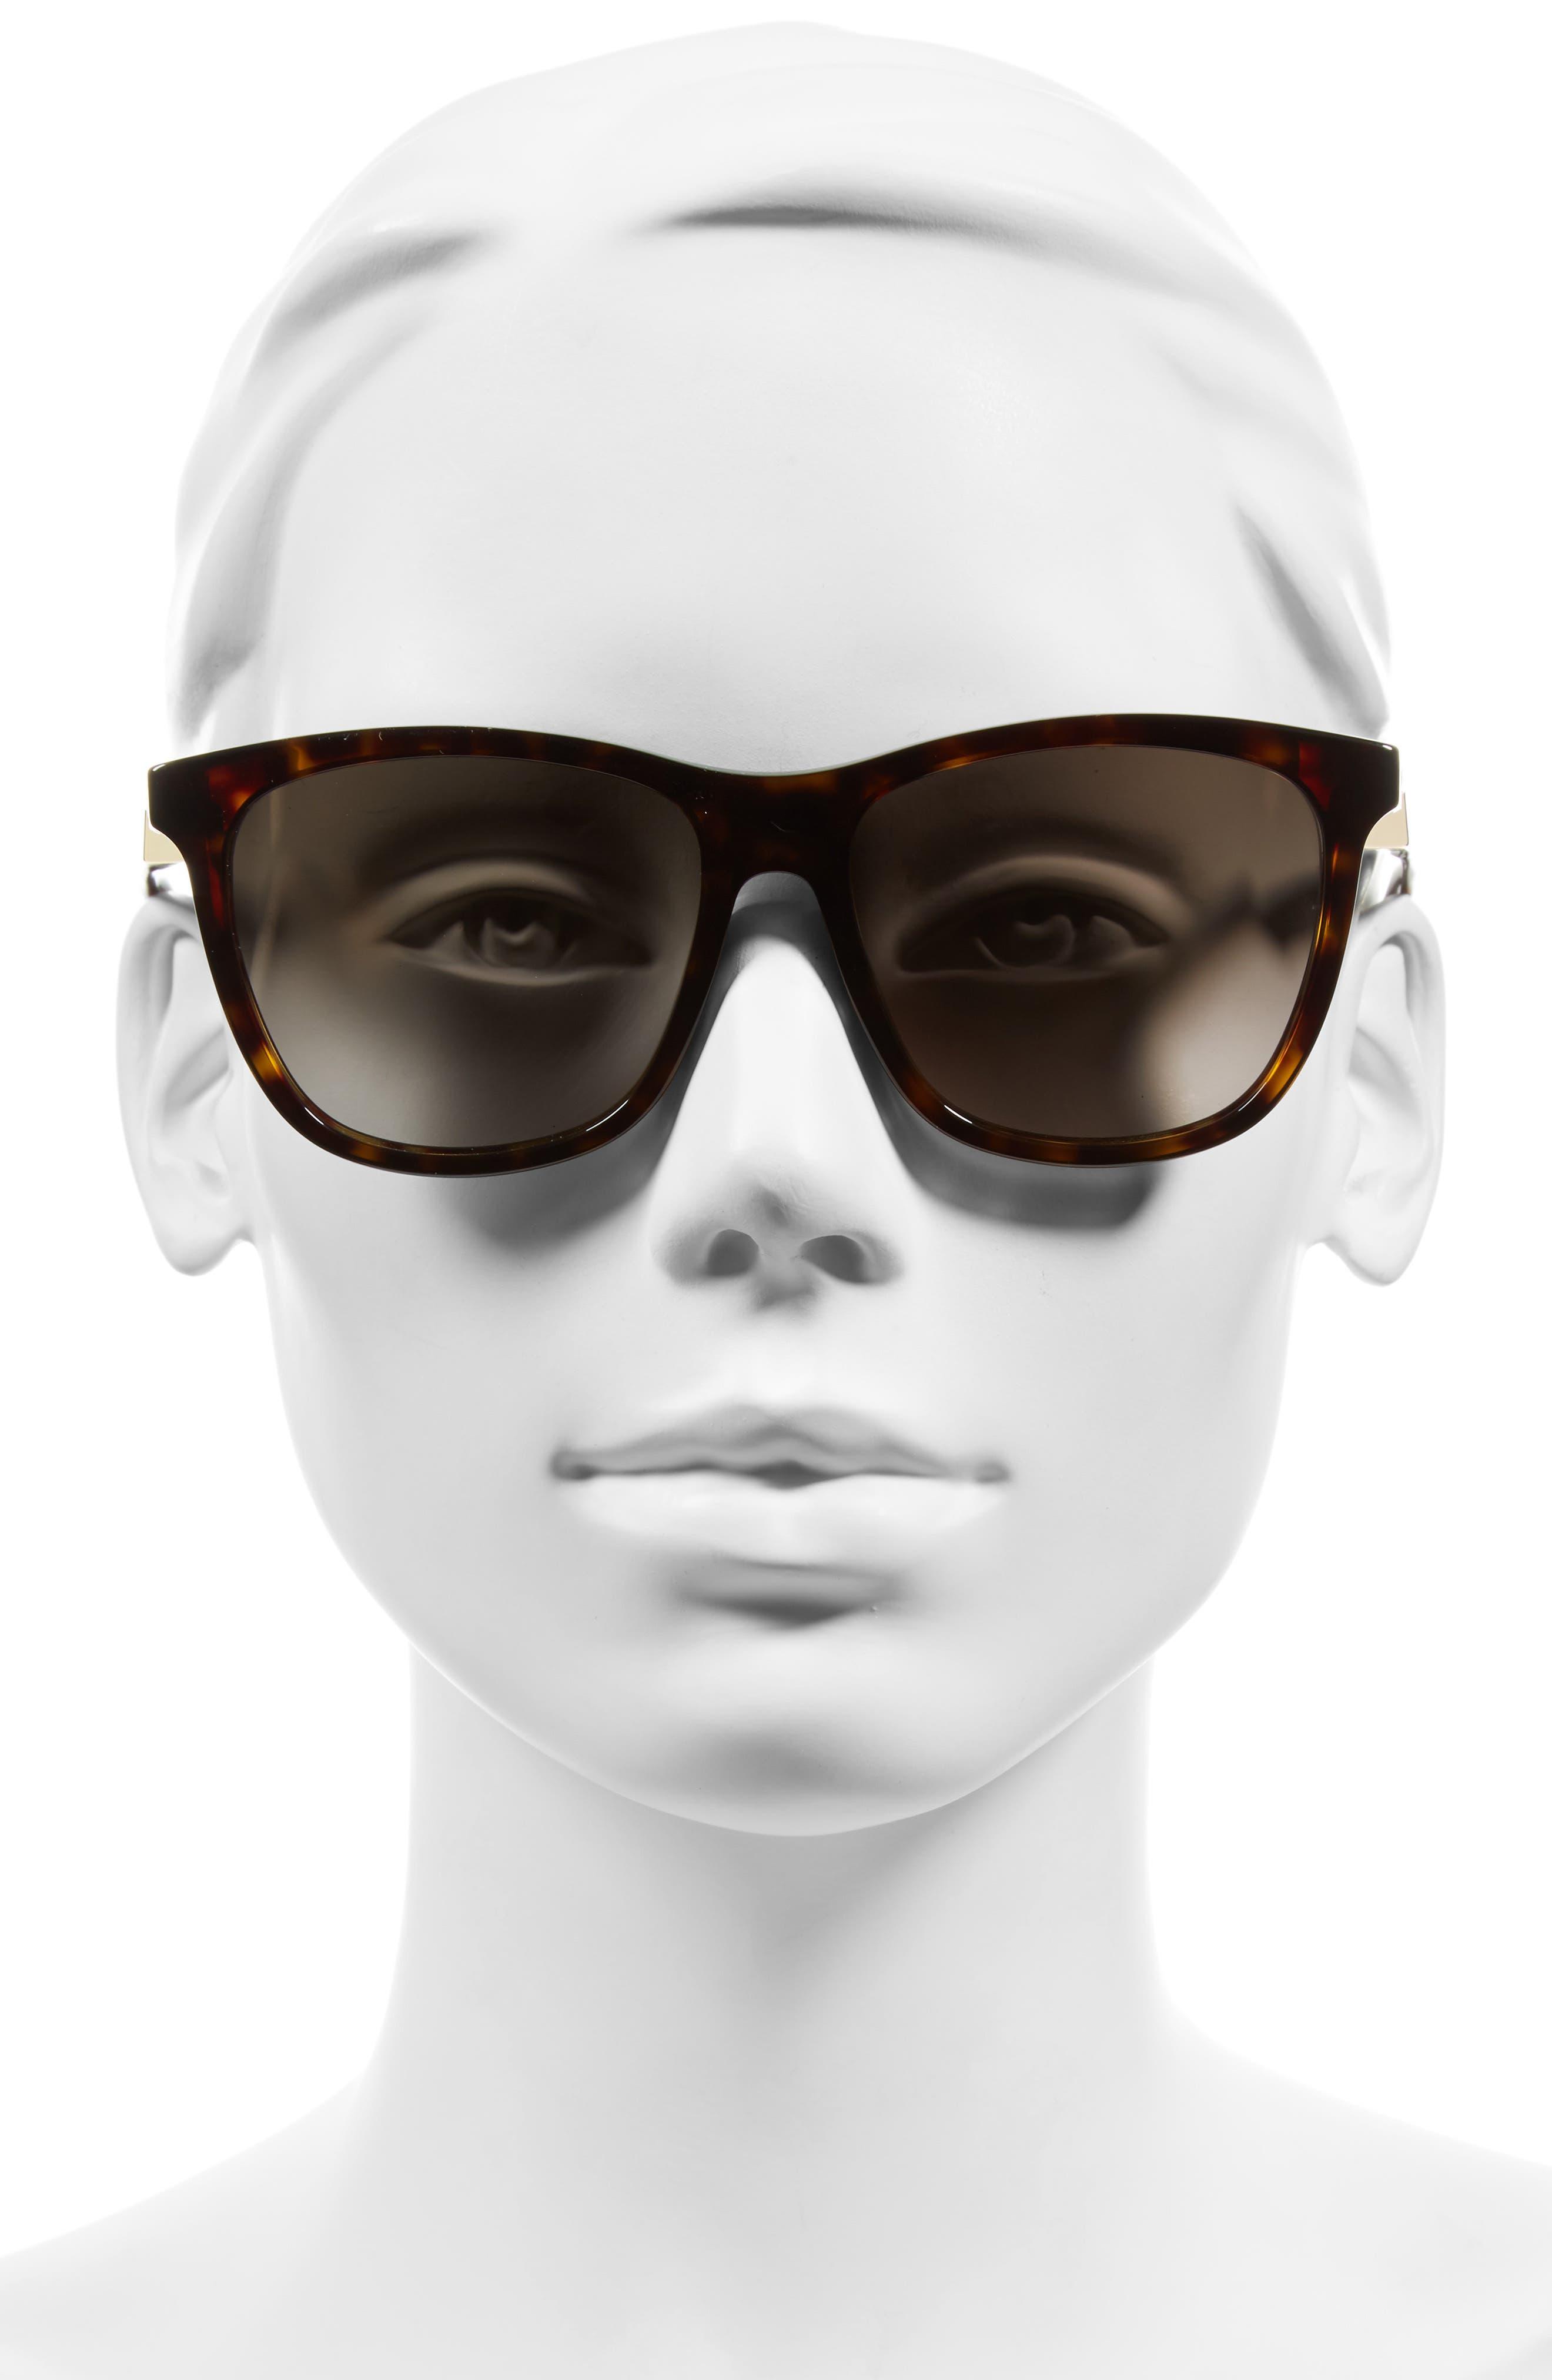 55mm Cube Retro Sunglasses,                             Alternate thumbnail 6, color,